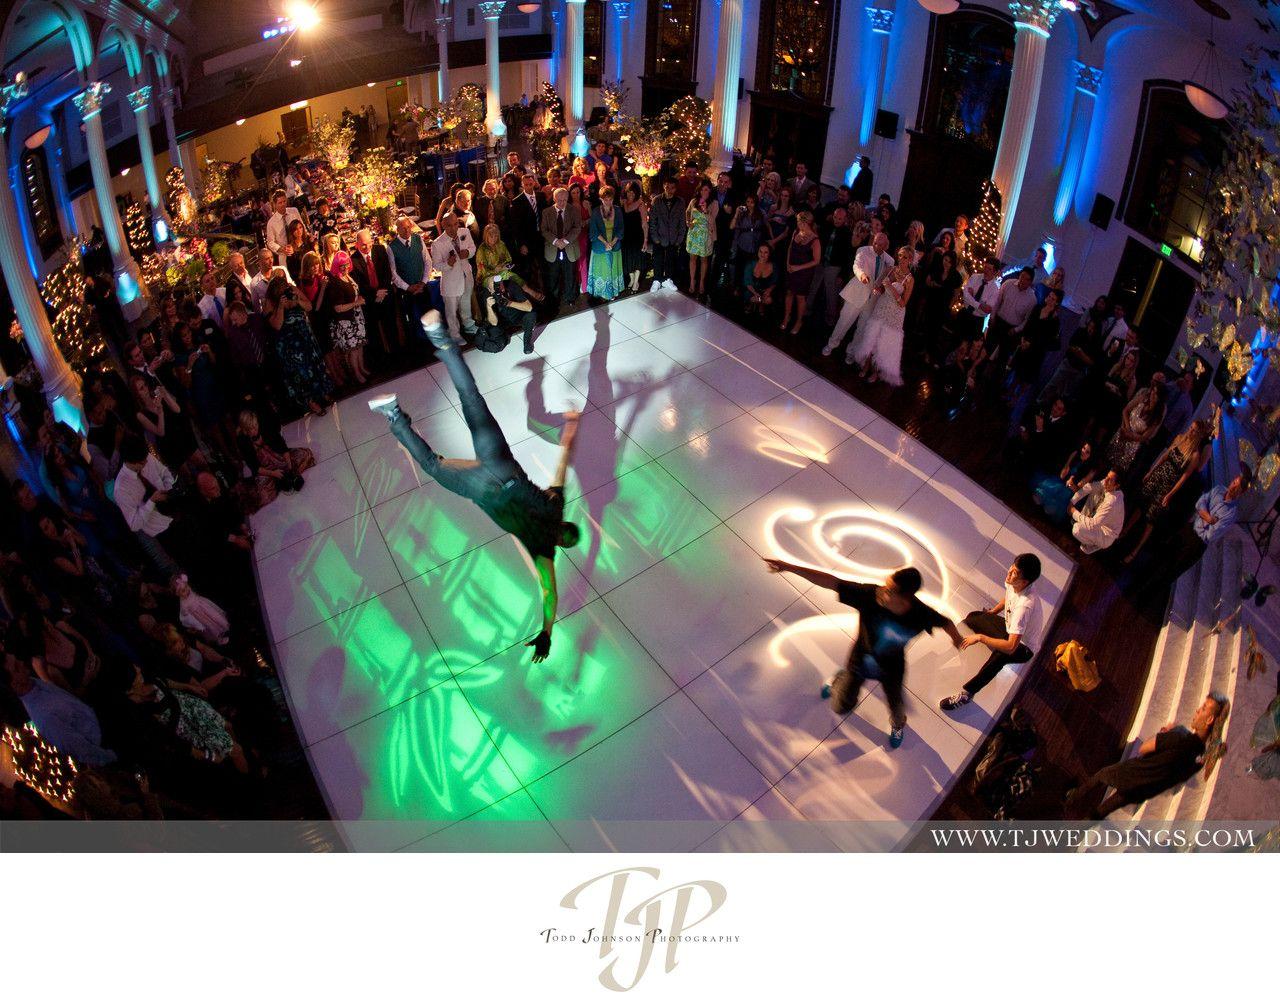 Vibiana wedding photography Coordination by Deborah James Bella Vita Events www.bellavitaevents.com flowers by Bova | Floral Design Studio